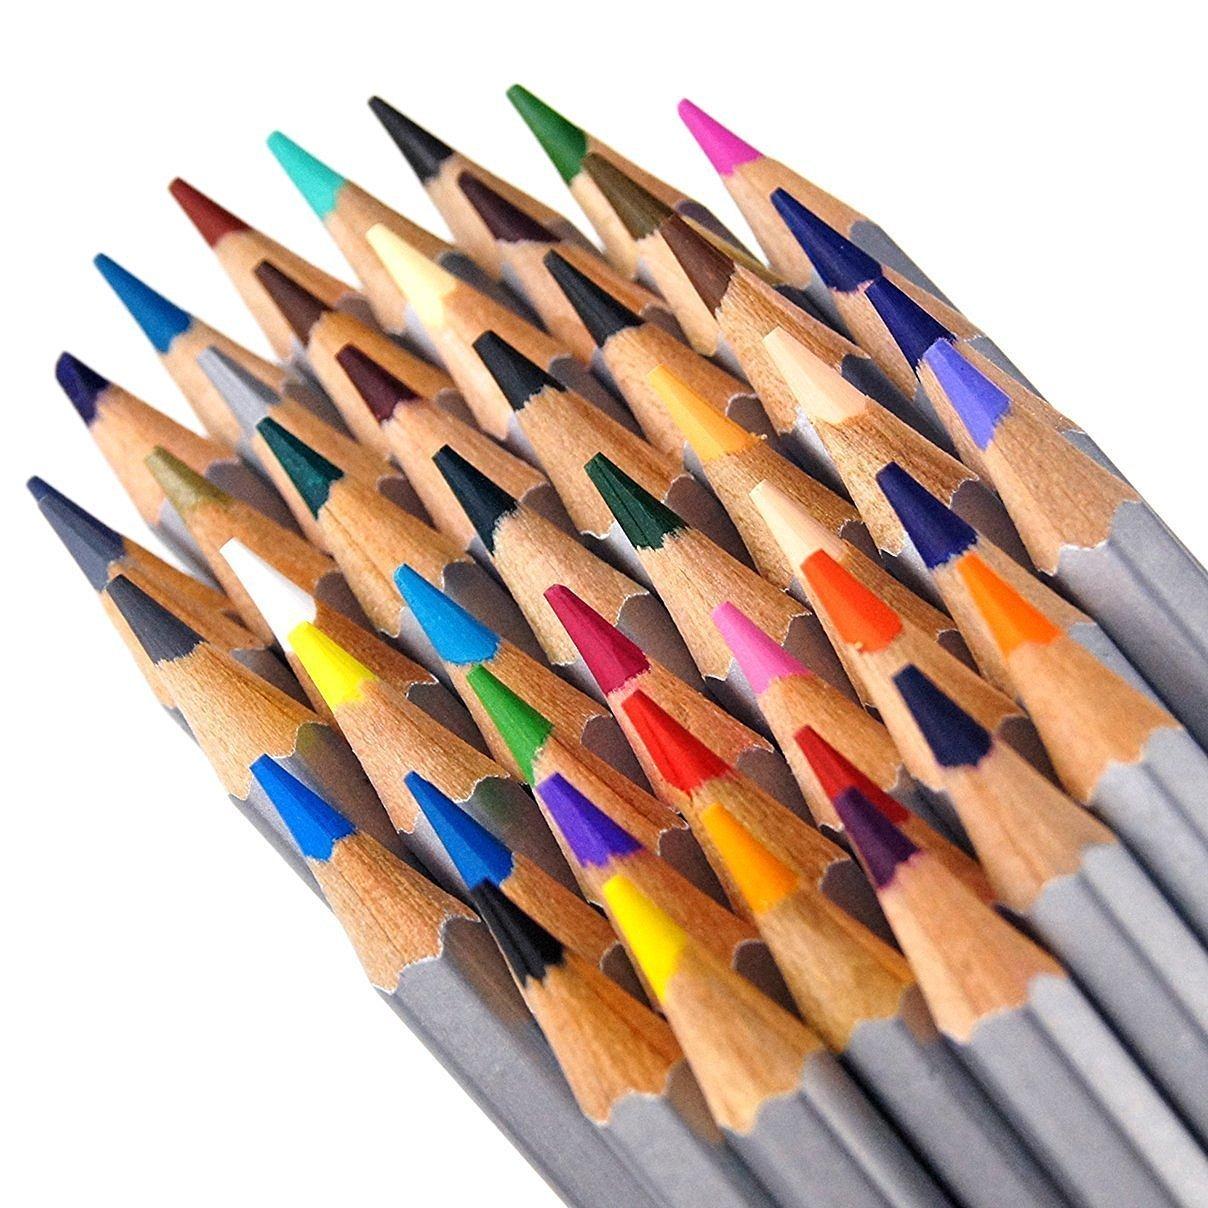 MelonBoat Professional Colored Pencils 24 Sets, 36 Count